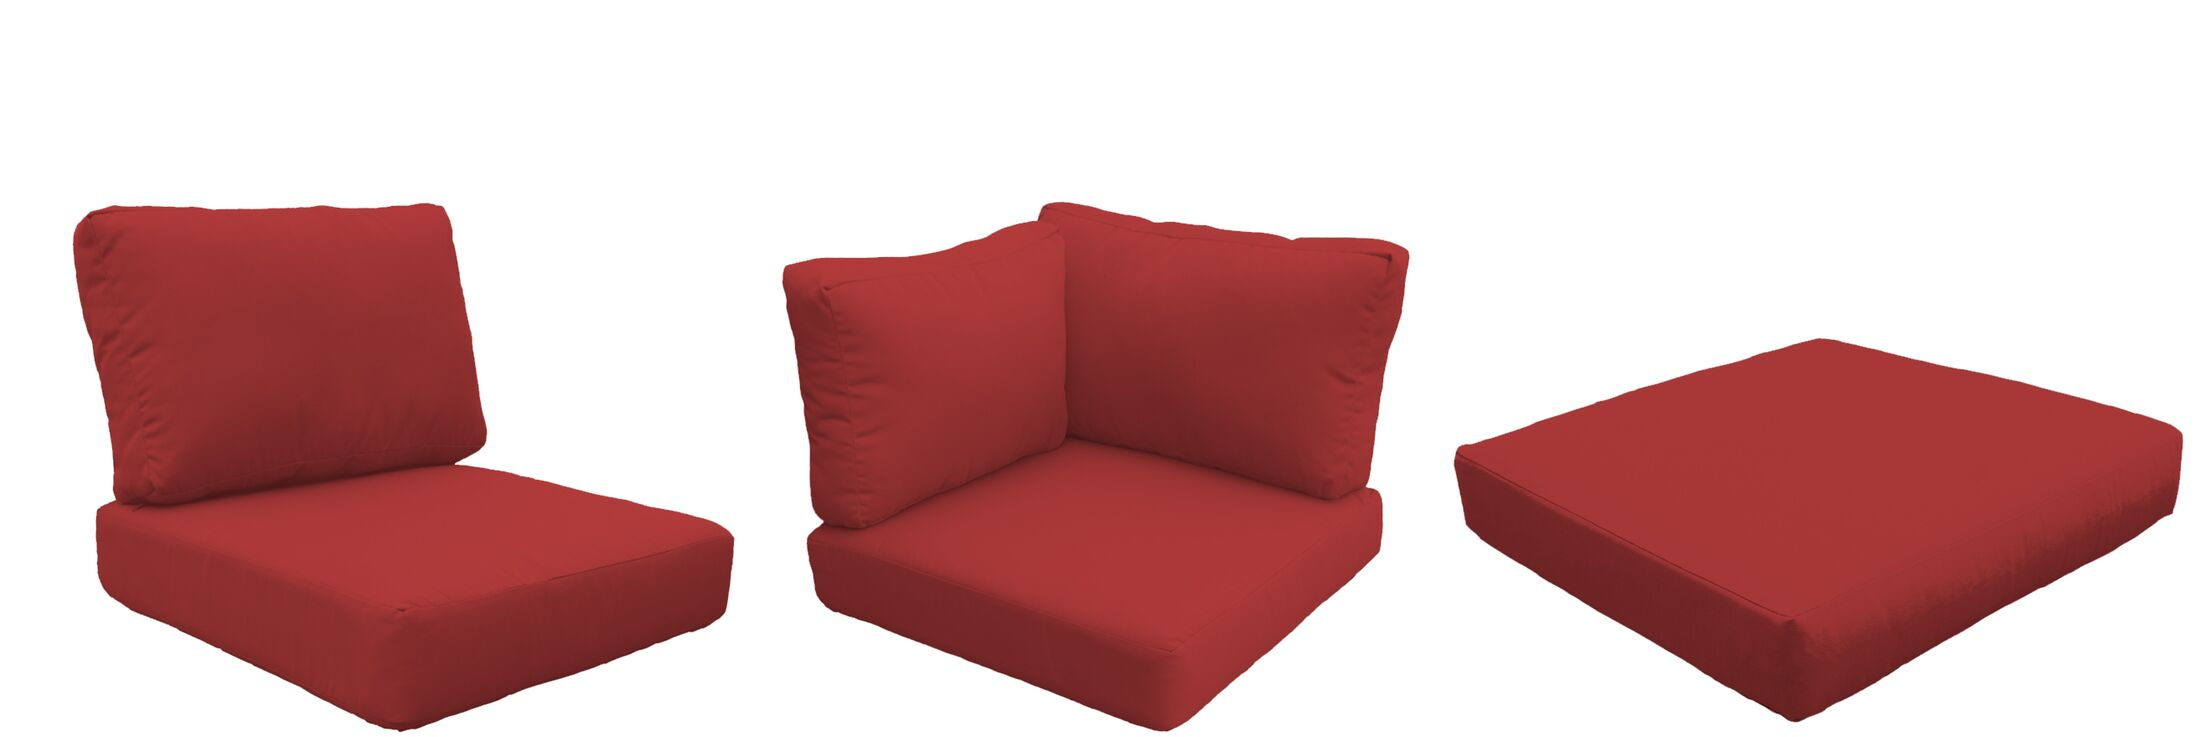 Coast 9 Piece Outdoor�Lounge Chair Cushion Set Fabric: Terracotta